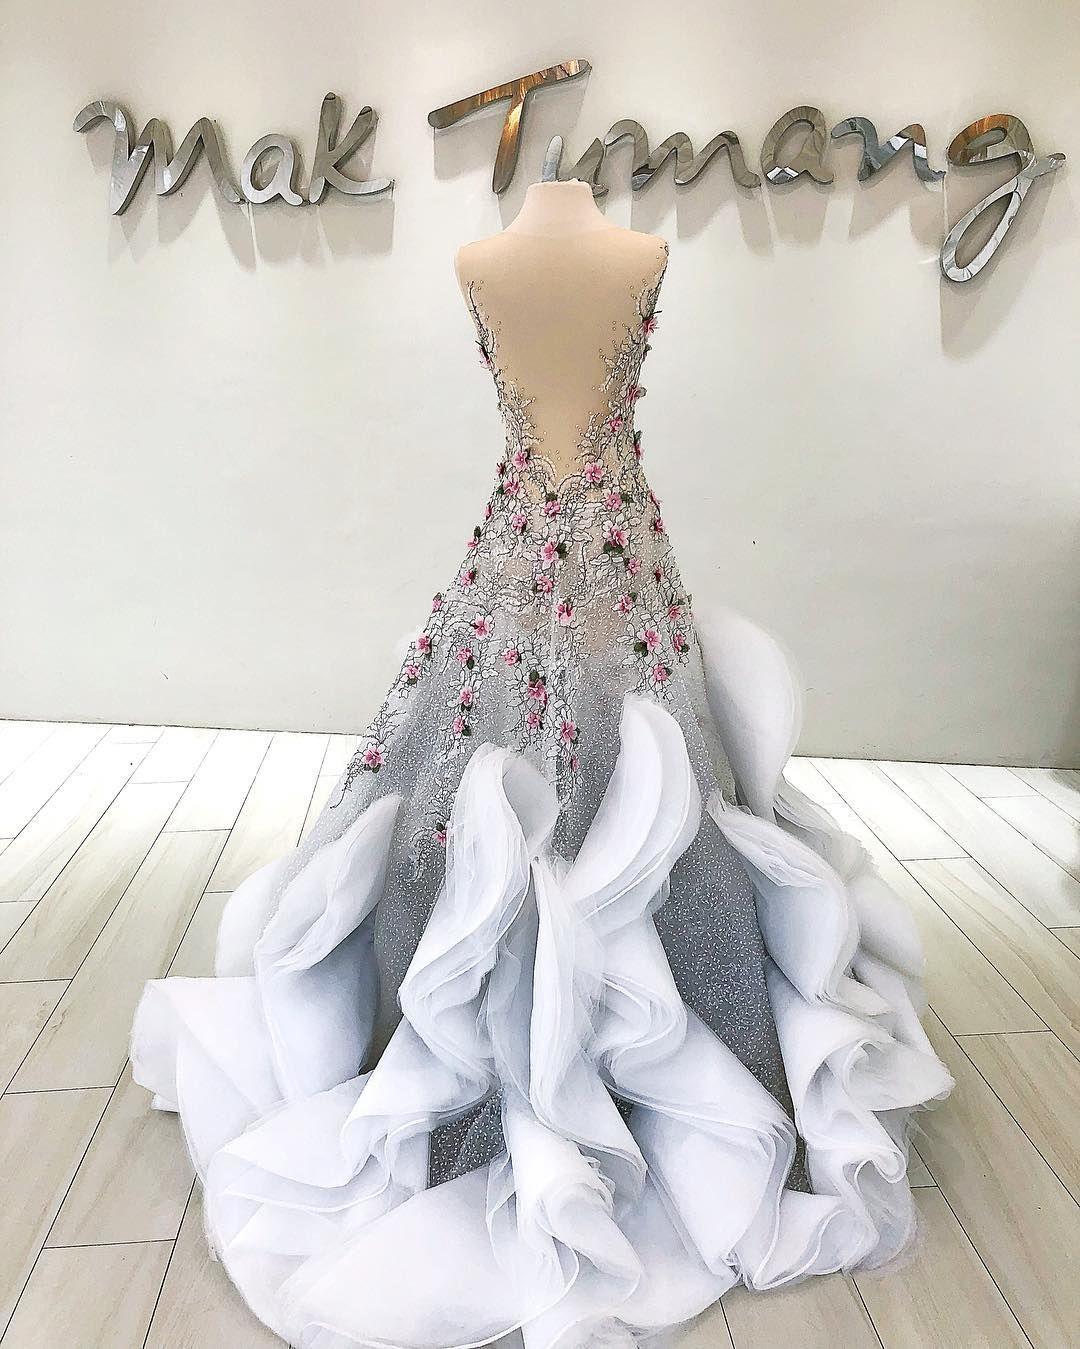 Kim  atelier  prom  debut  bride  wedding  weddingdress  gown  fashion   design  style  couture  maktumang  quinceañera  quinceanera  hautecouture ea5239f521c2